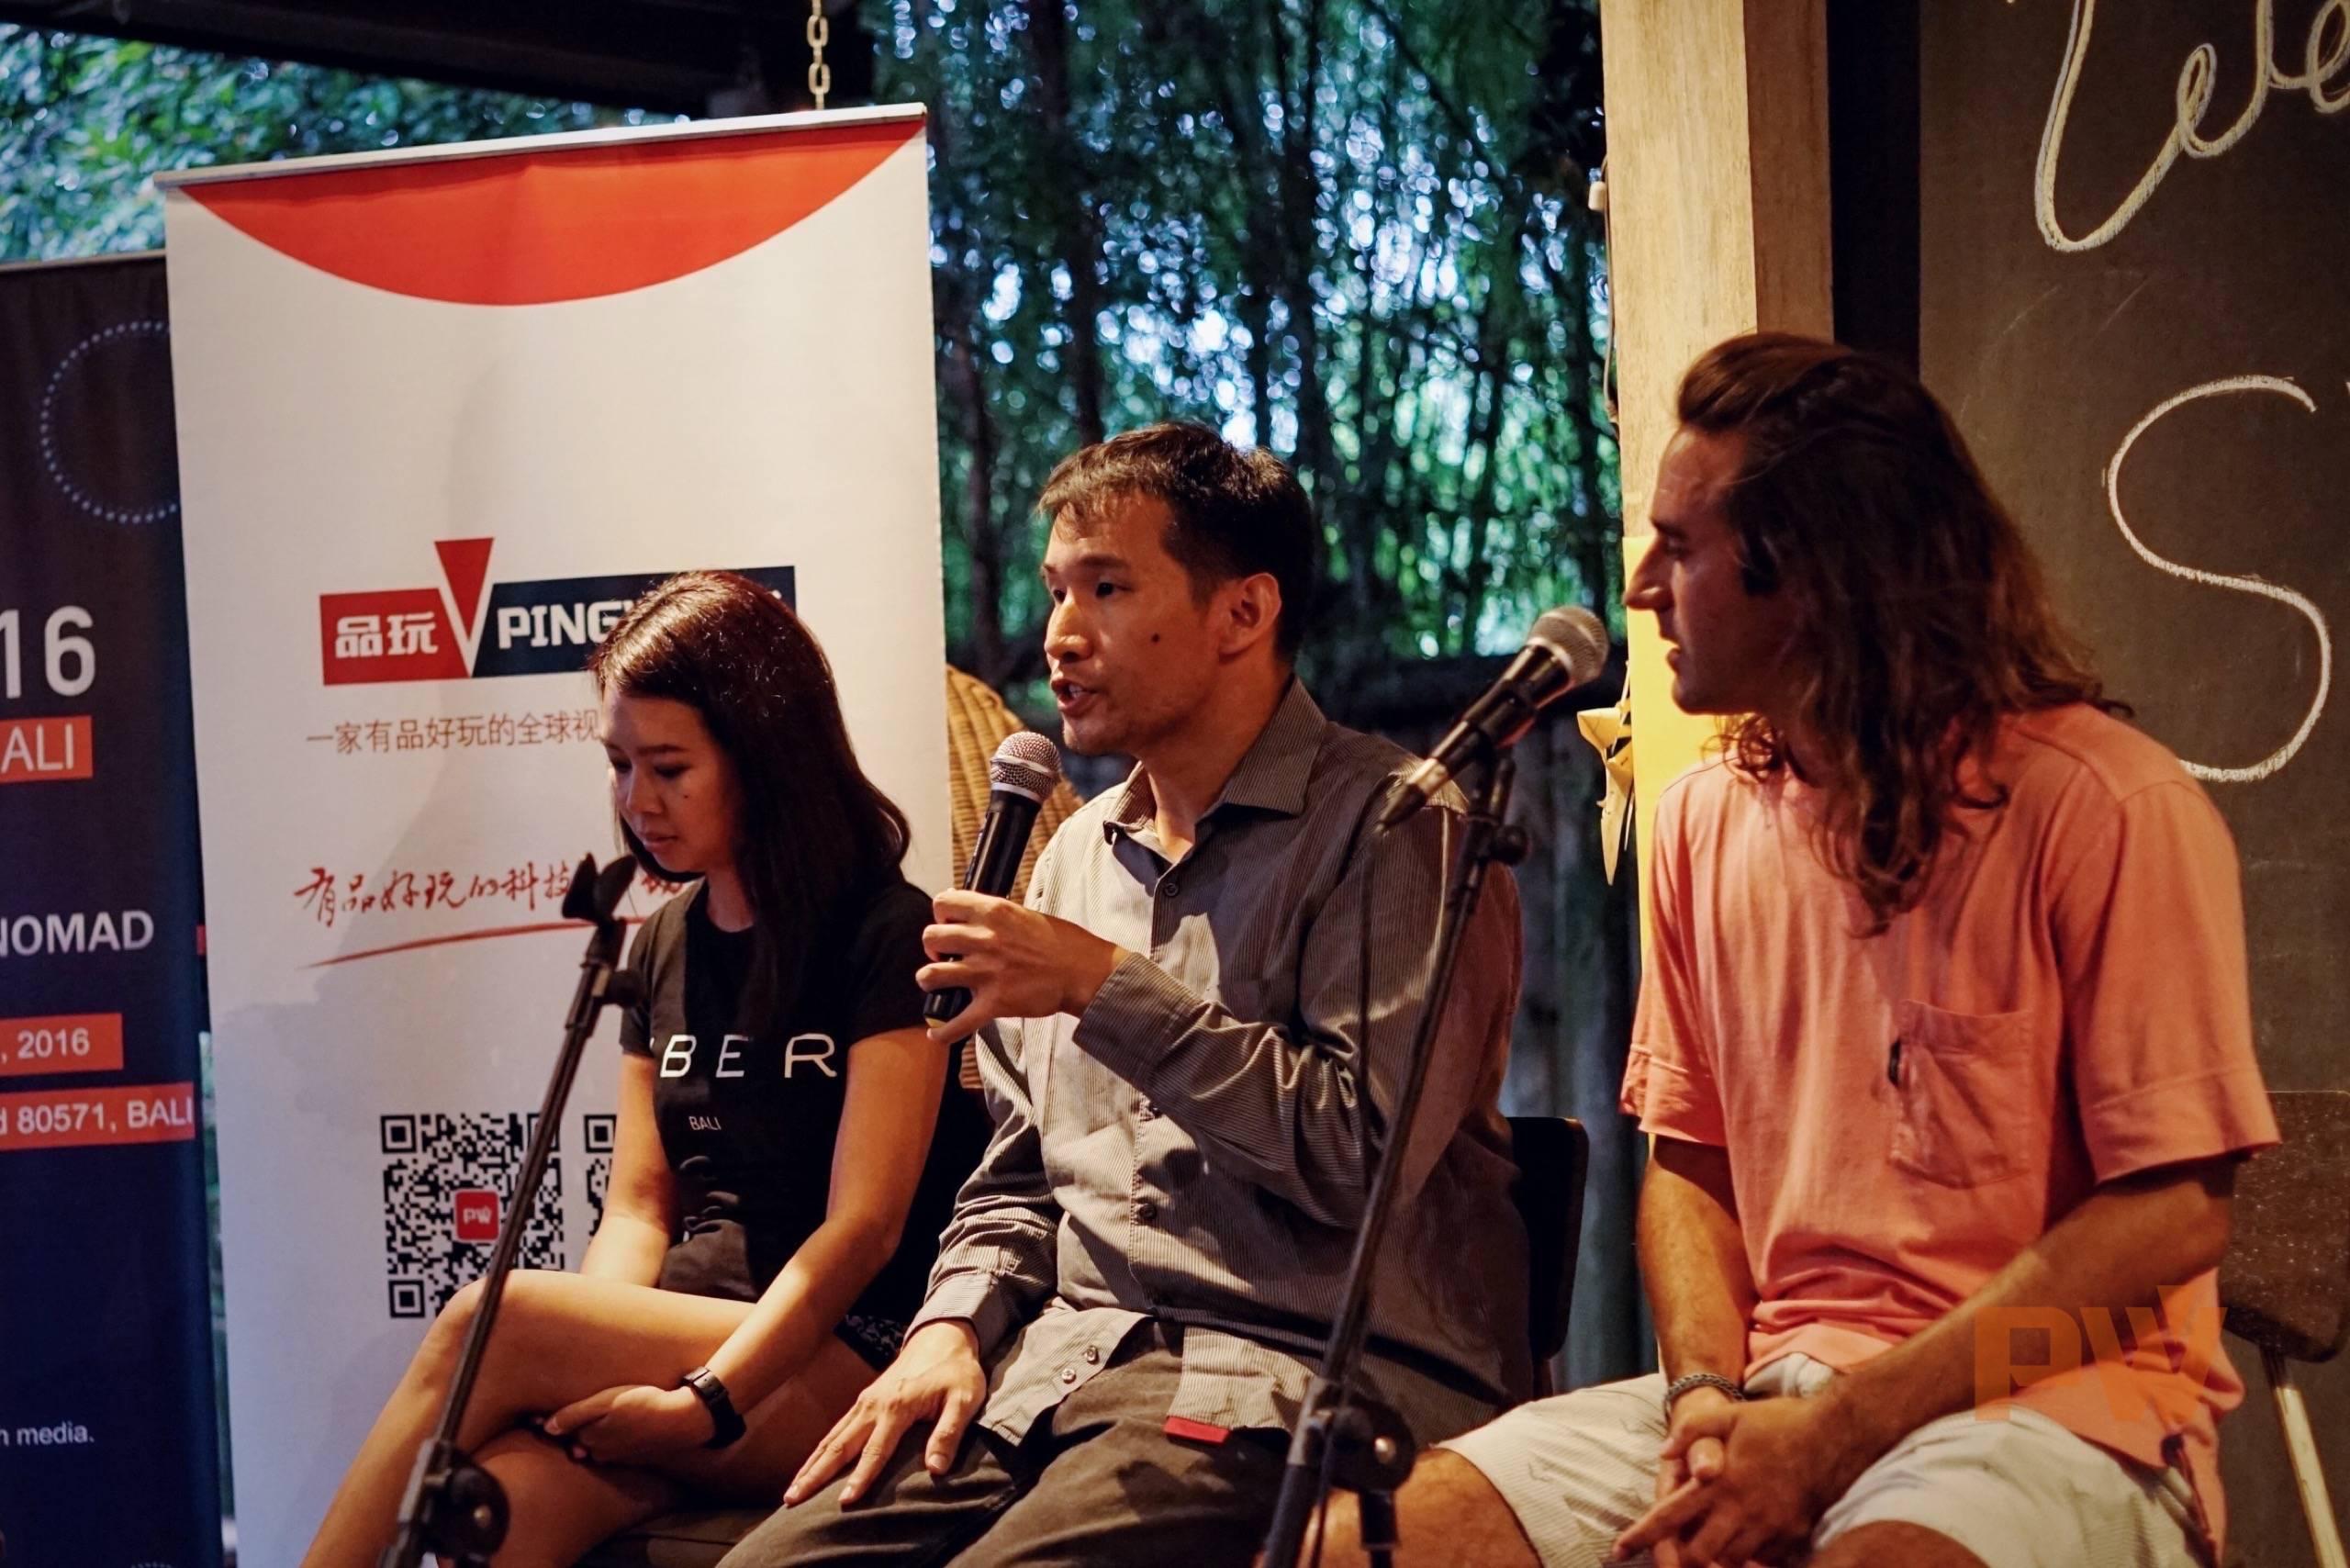 Anggun、Alan Yu 博士和 Georgi 分享他们在巴厘岛工作和生活的经验 / Photo by 光谱